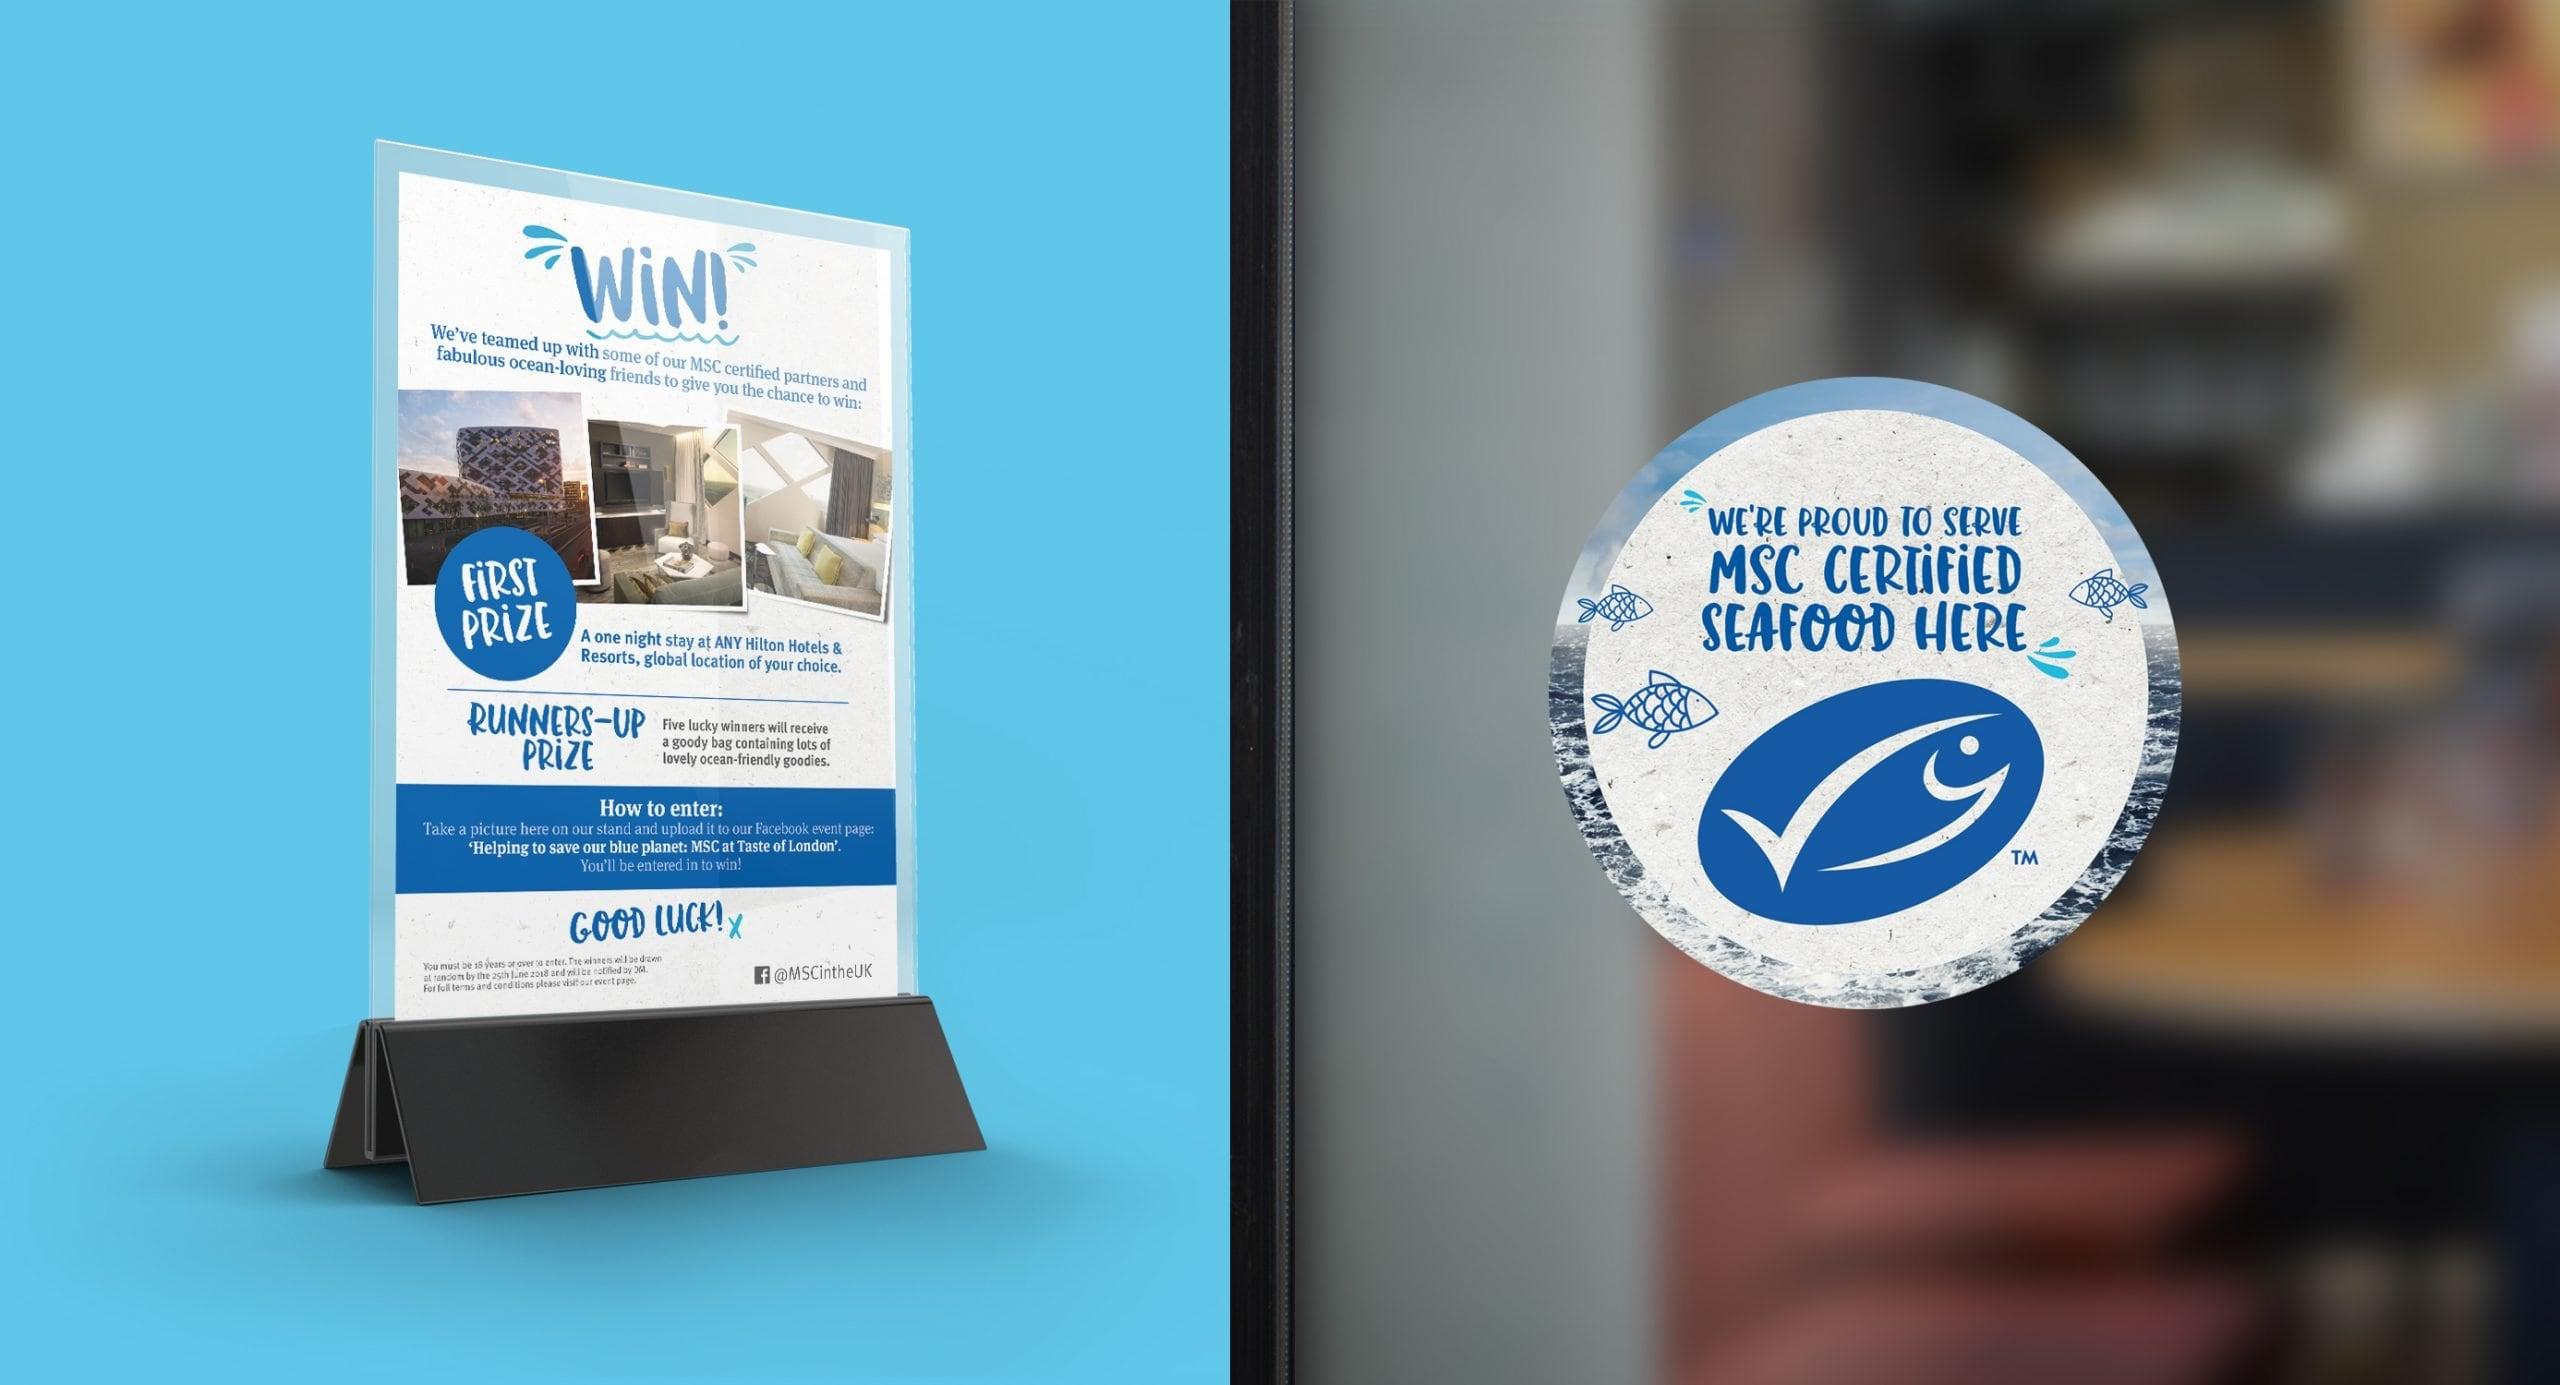 MSC anniversary – Counter card and window sticker